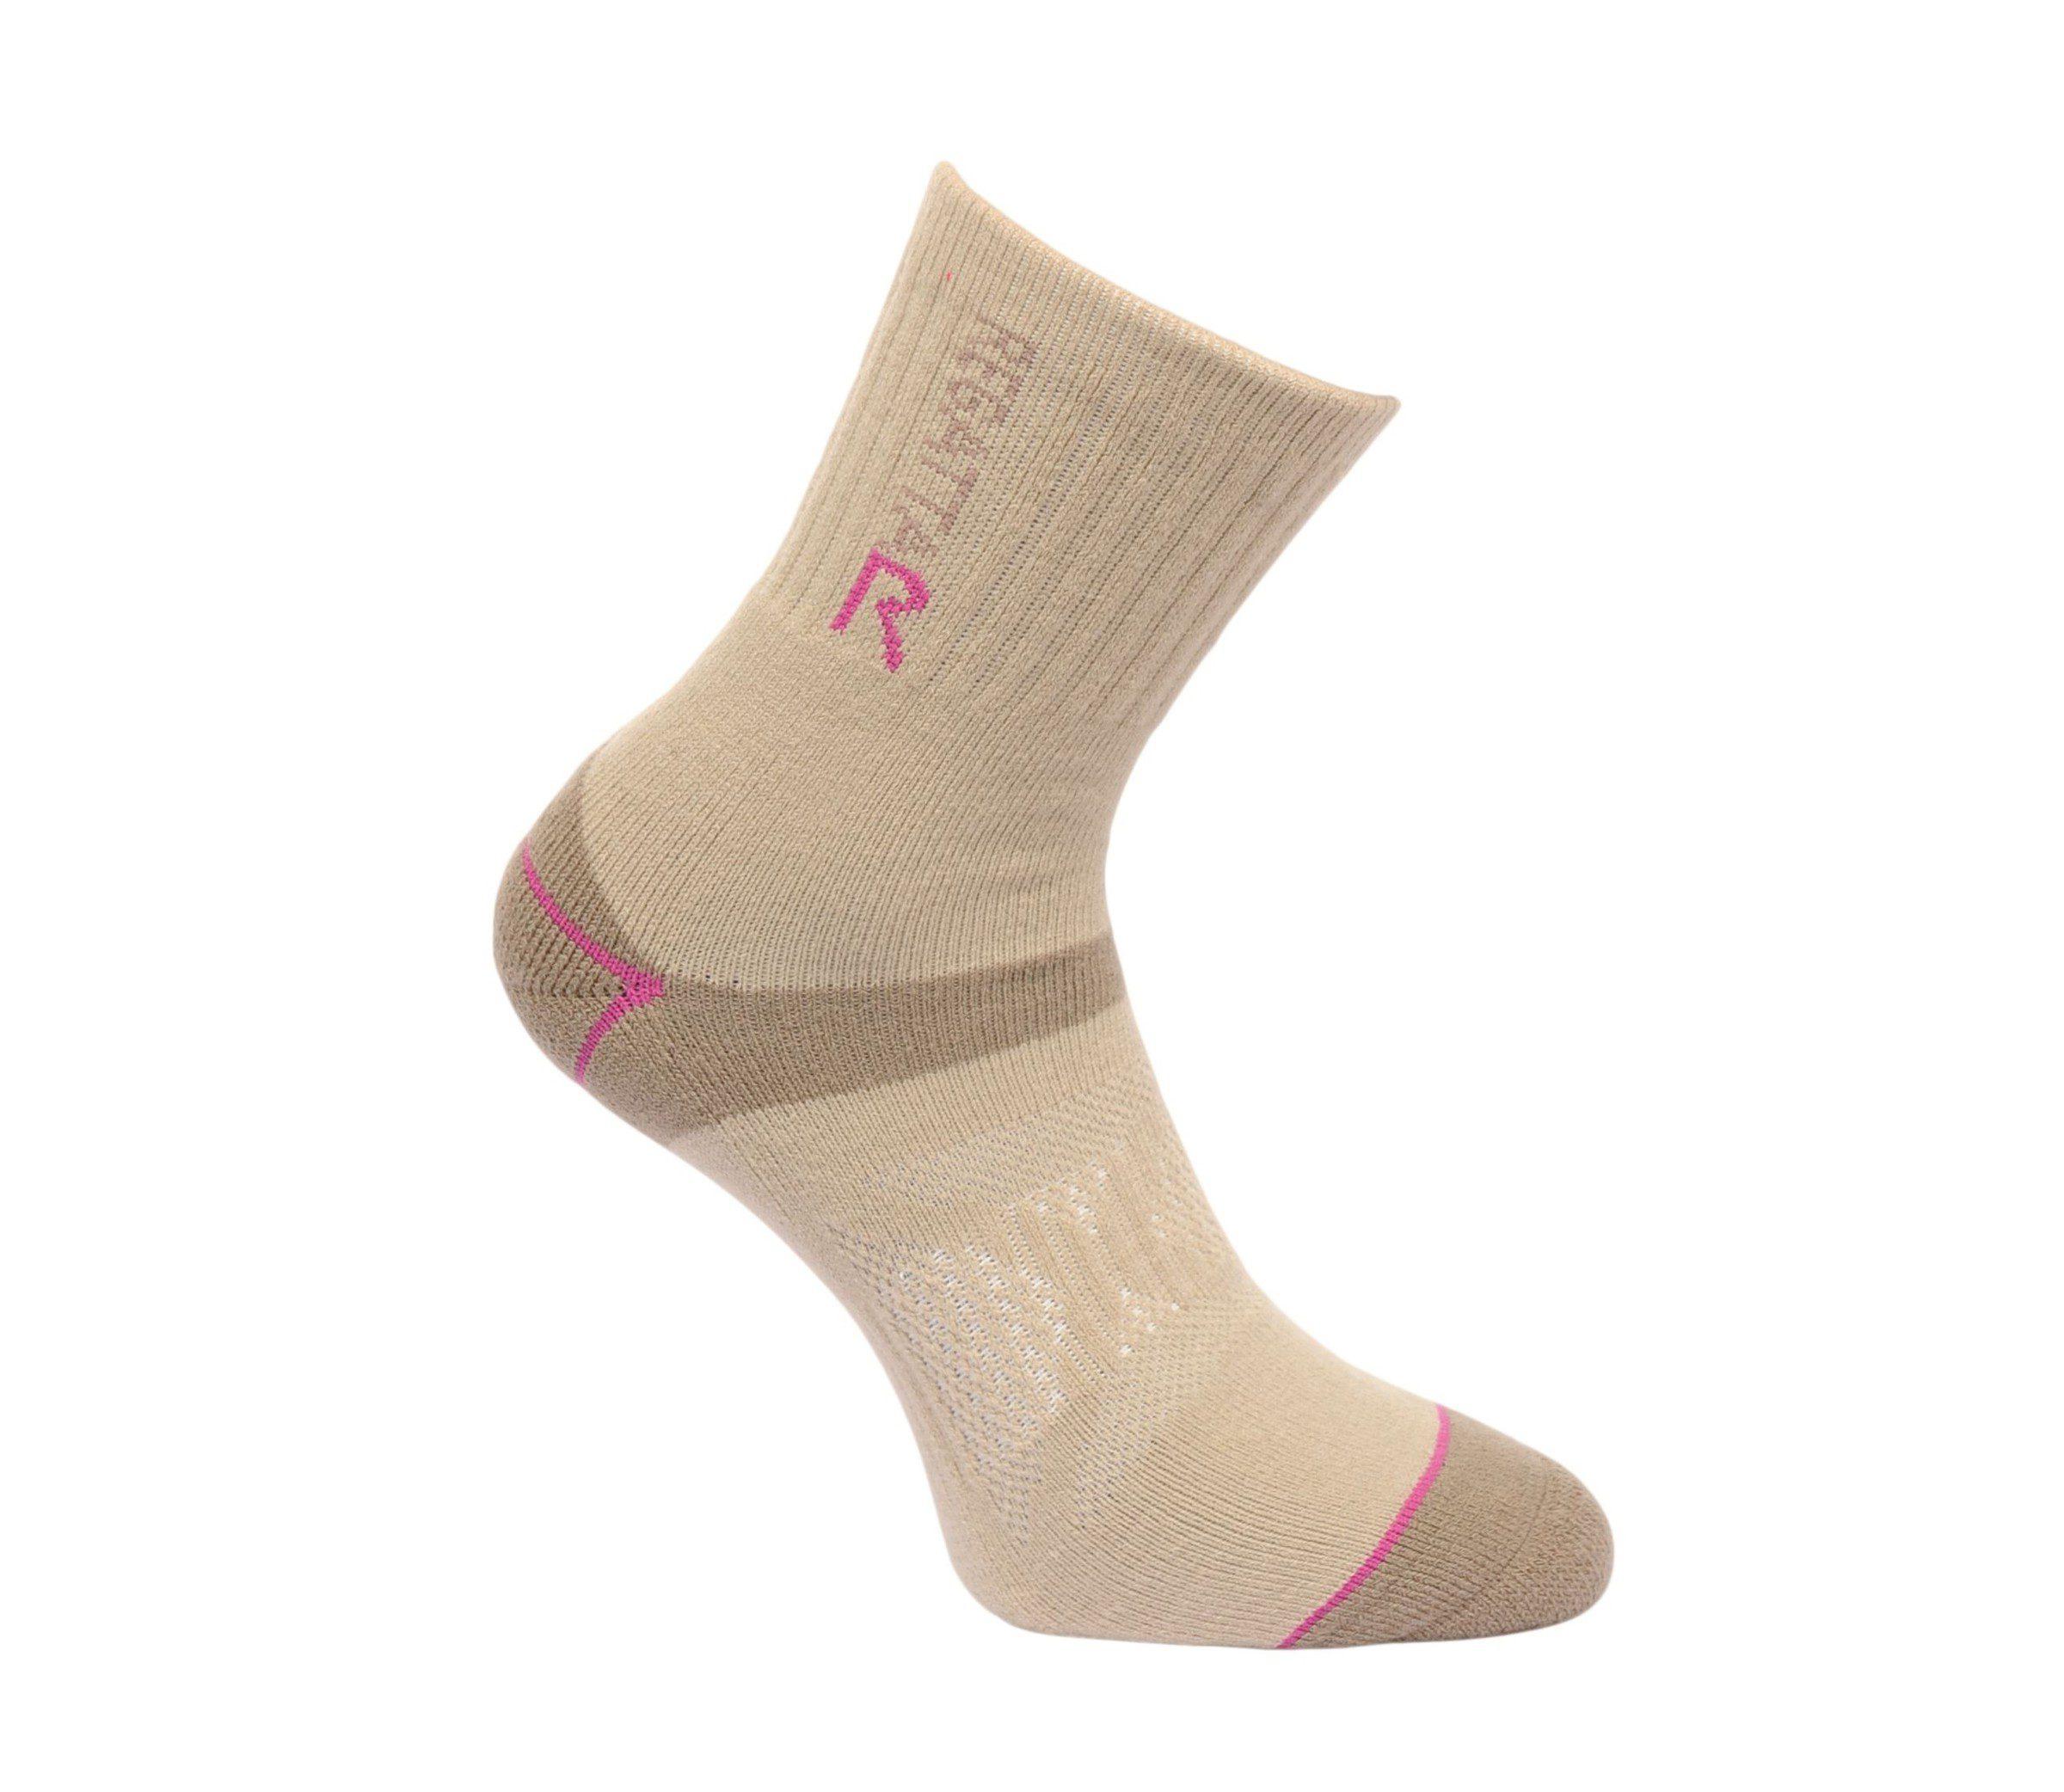 Regatta Blister Protection sock - viola